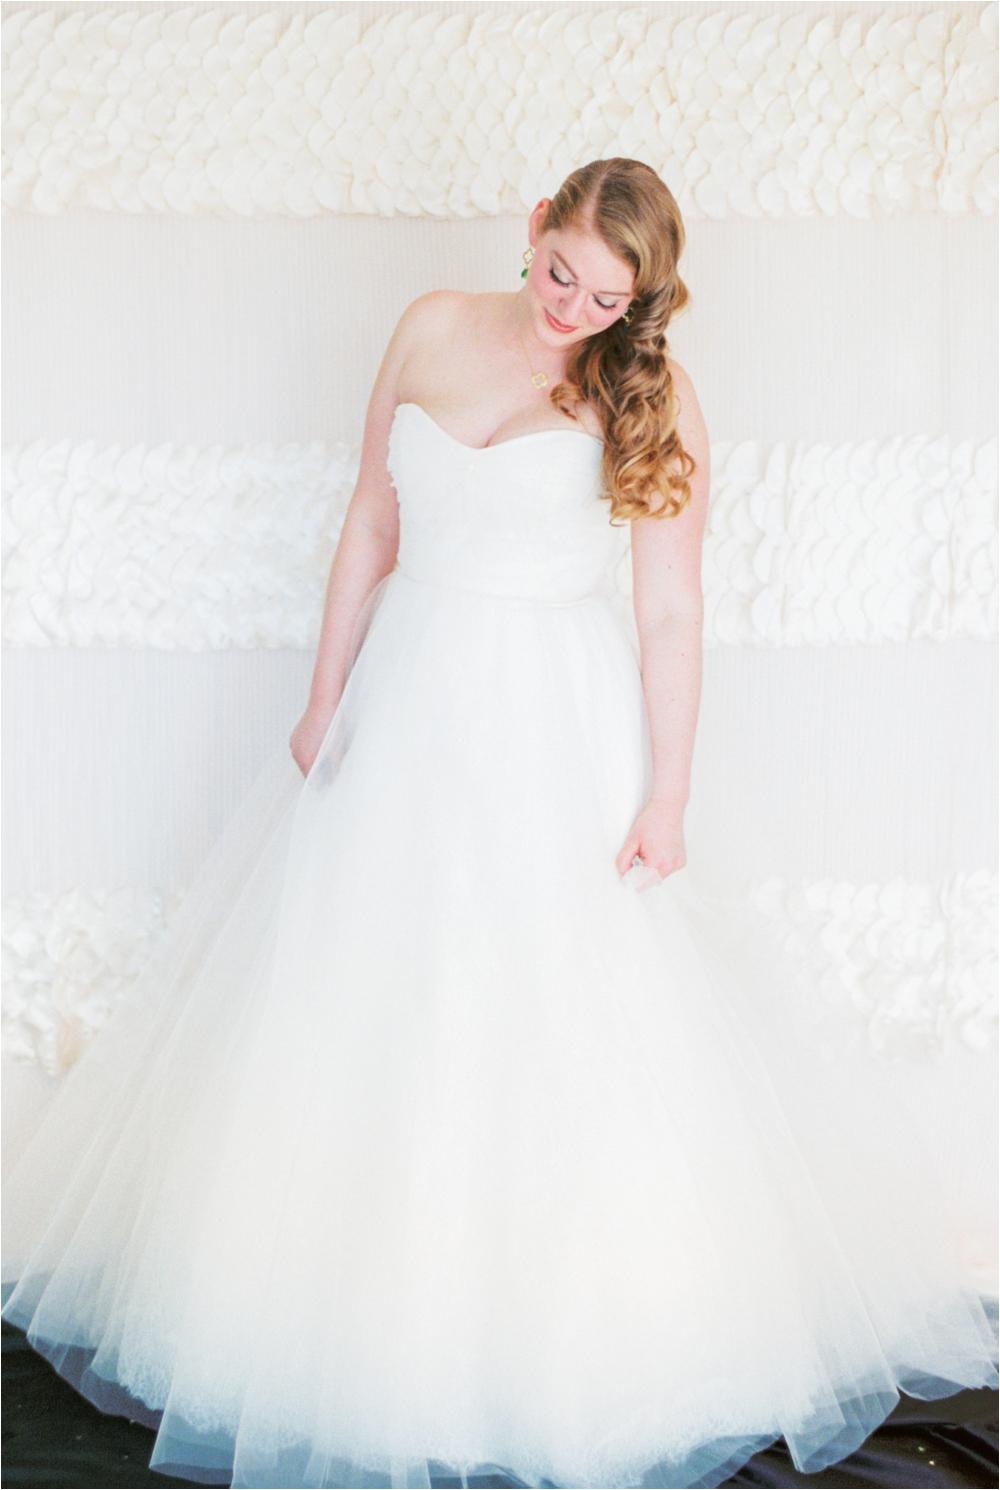 saint-patricks-day-wedding-inspiration-stephanie-yonce_0006